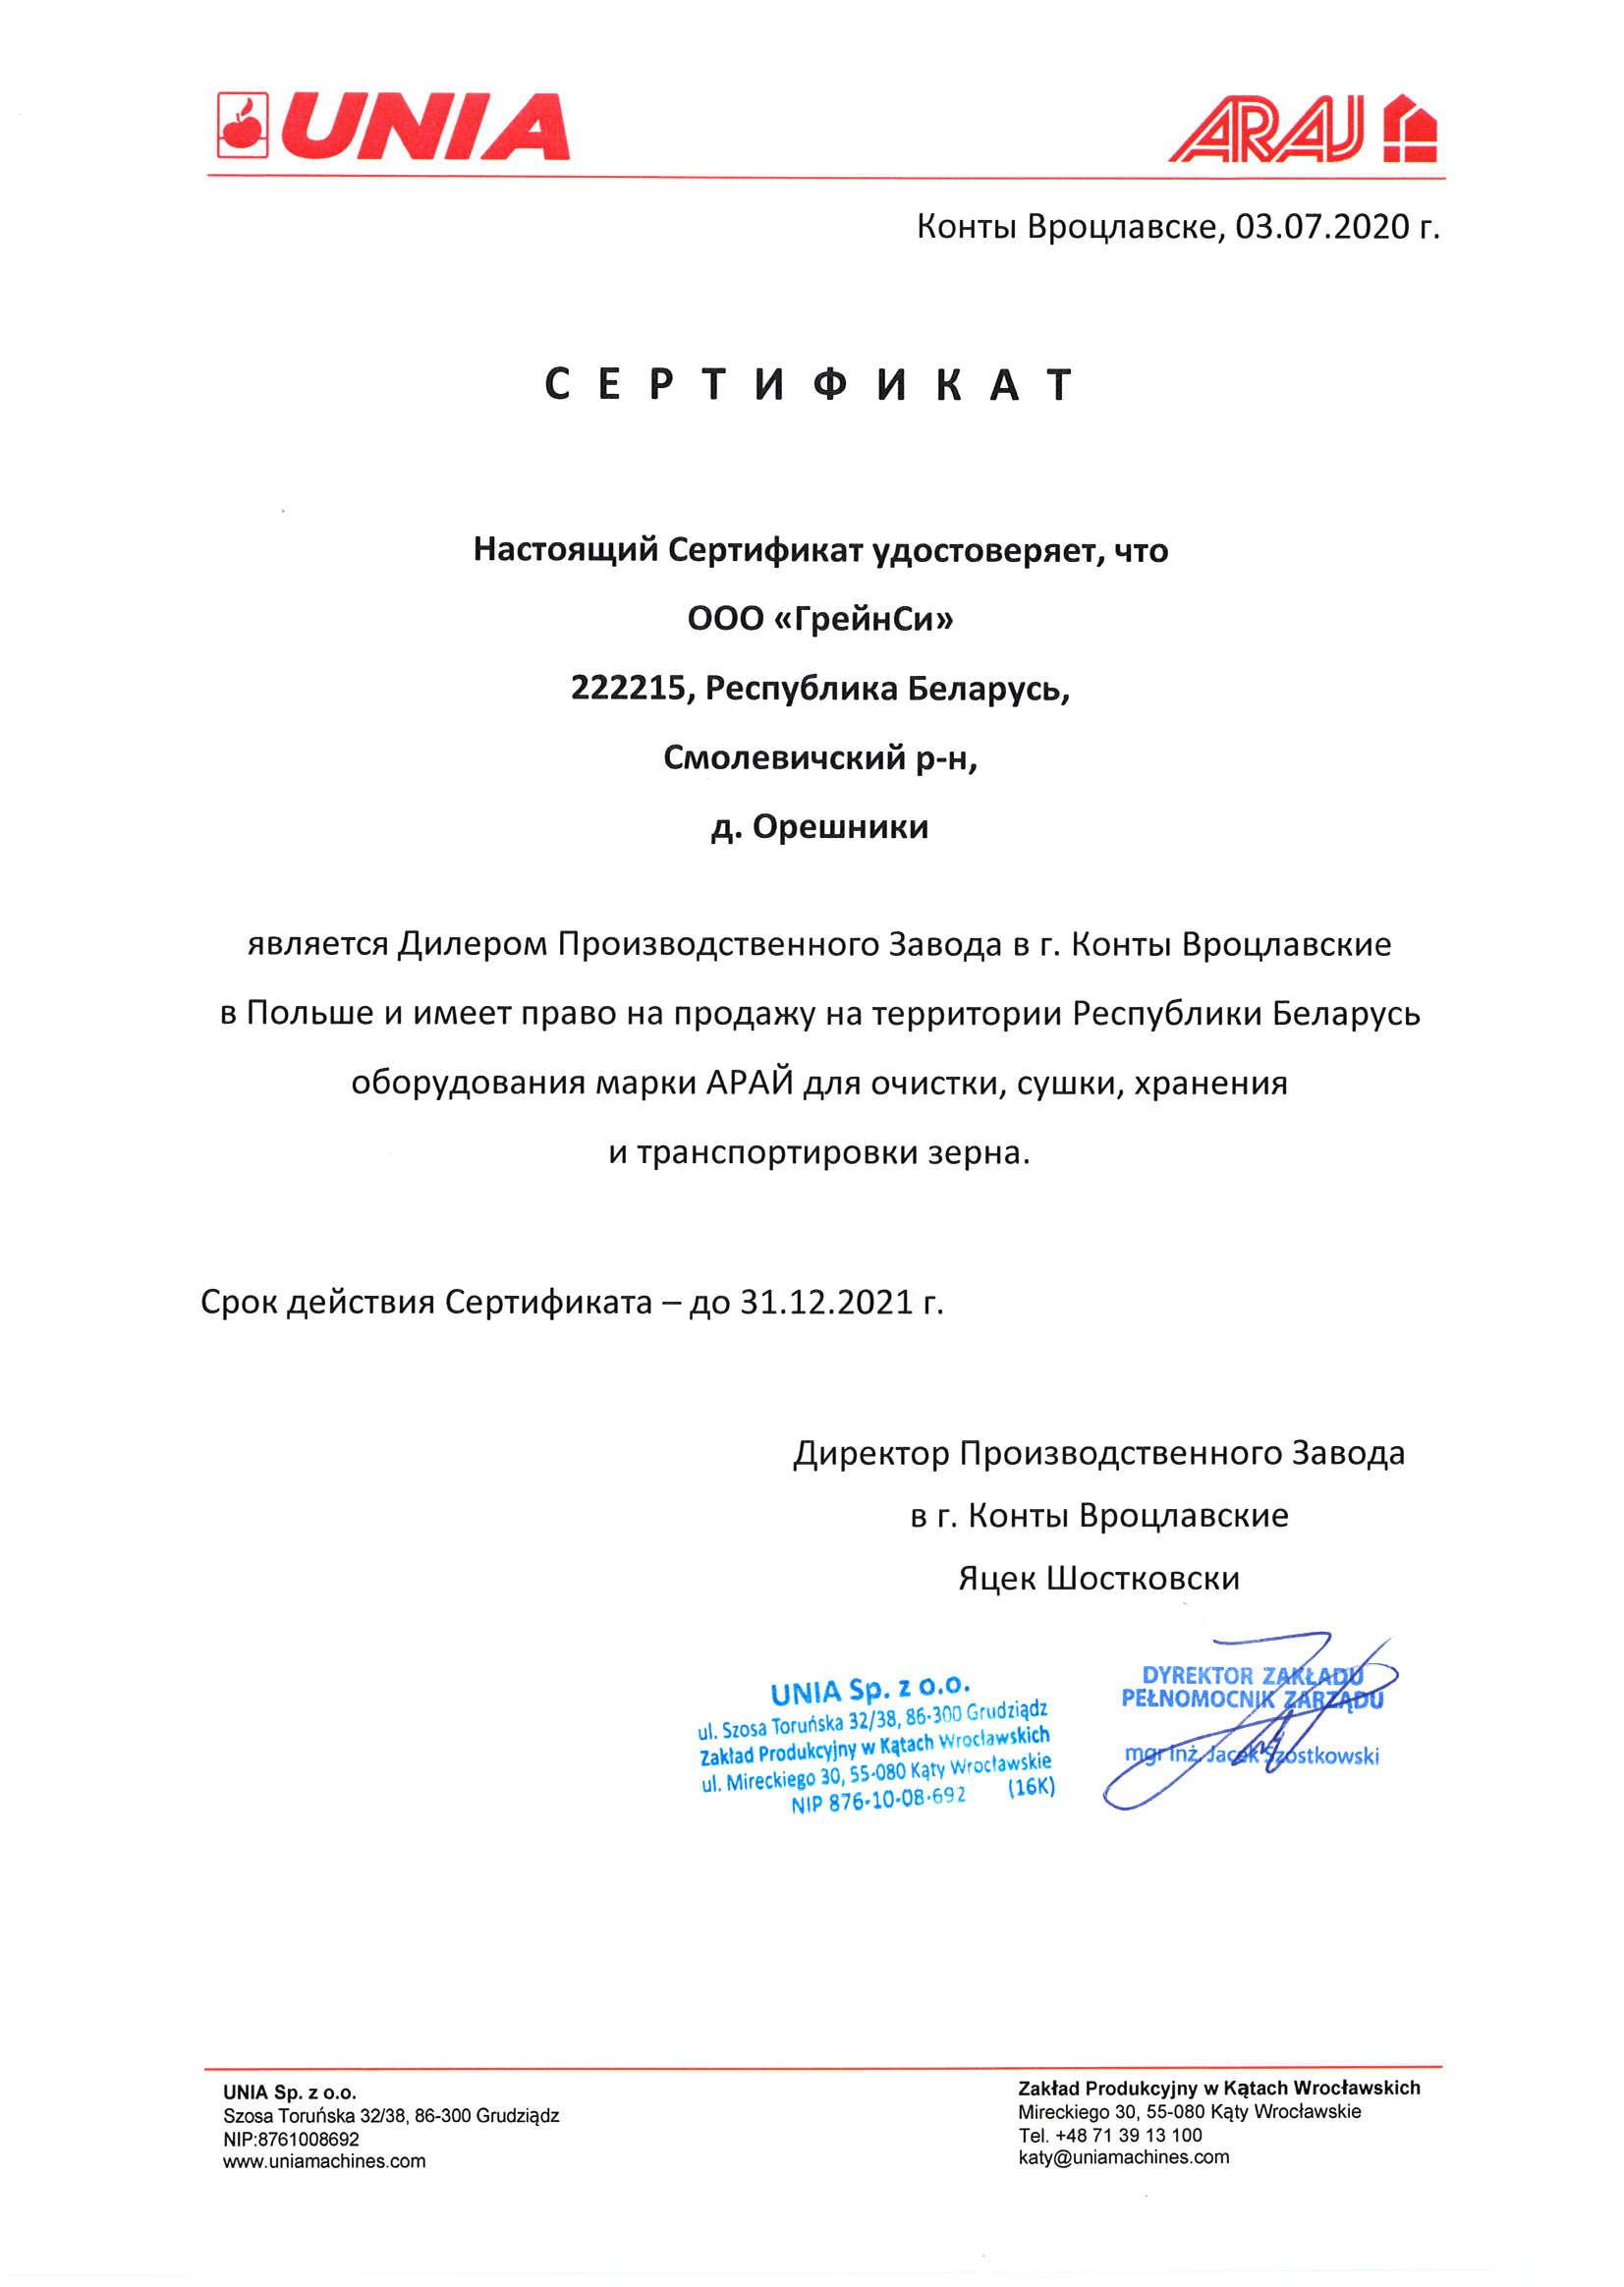 Сертификат 2022